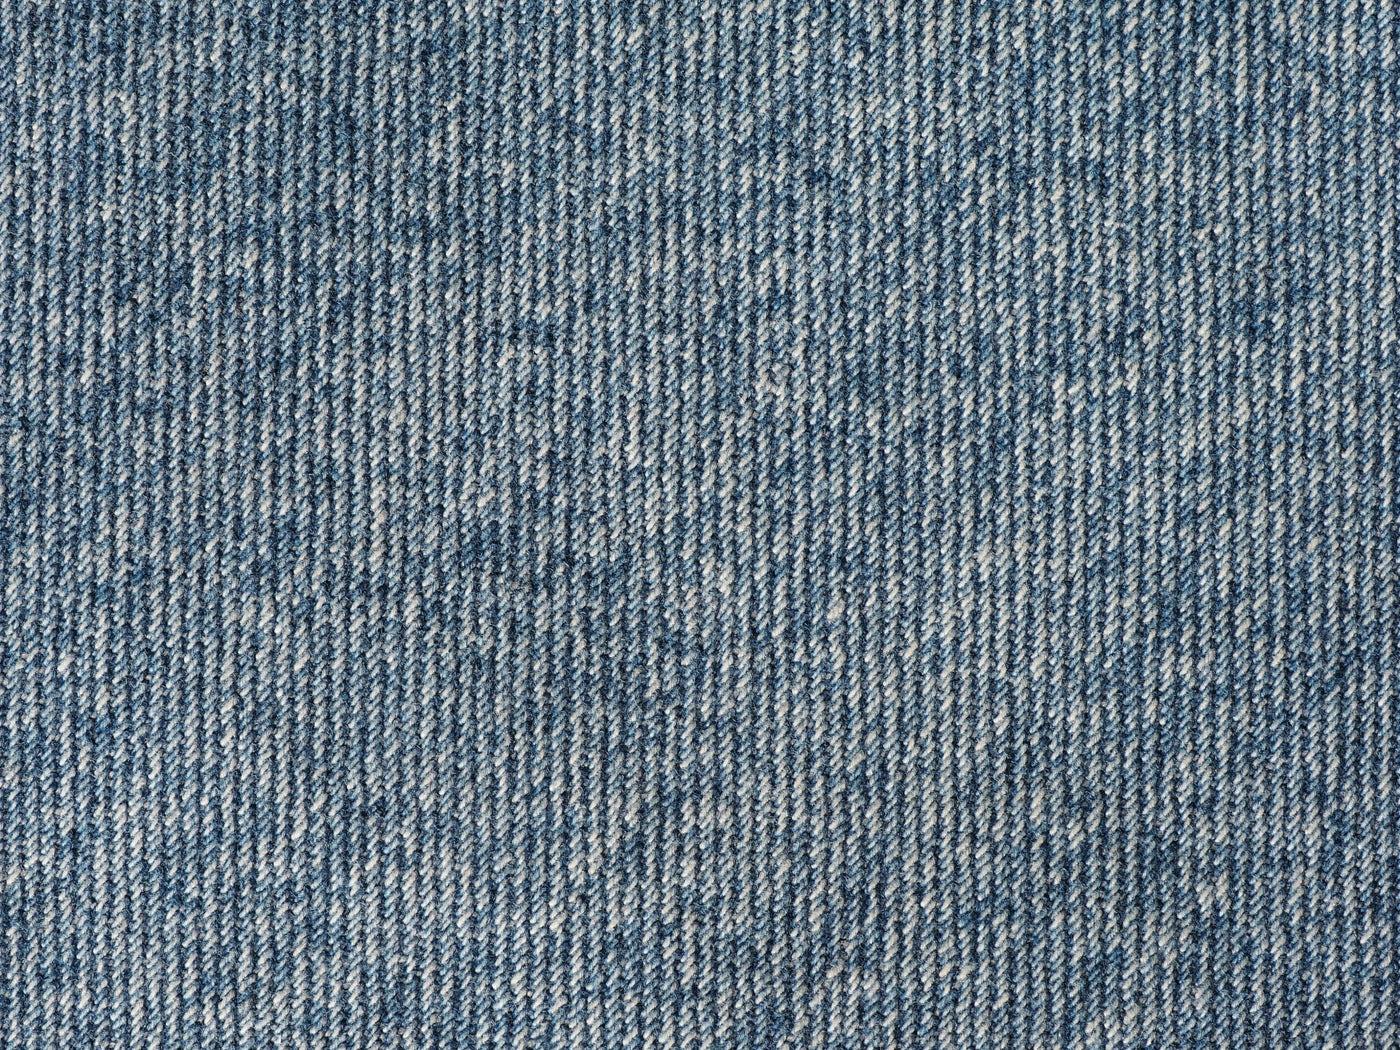 Blue Denim Jeans Fabric: Stock Photos